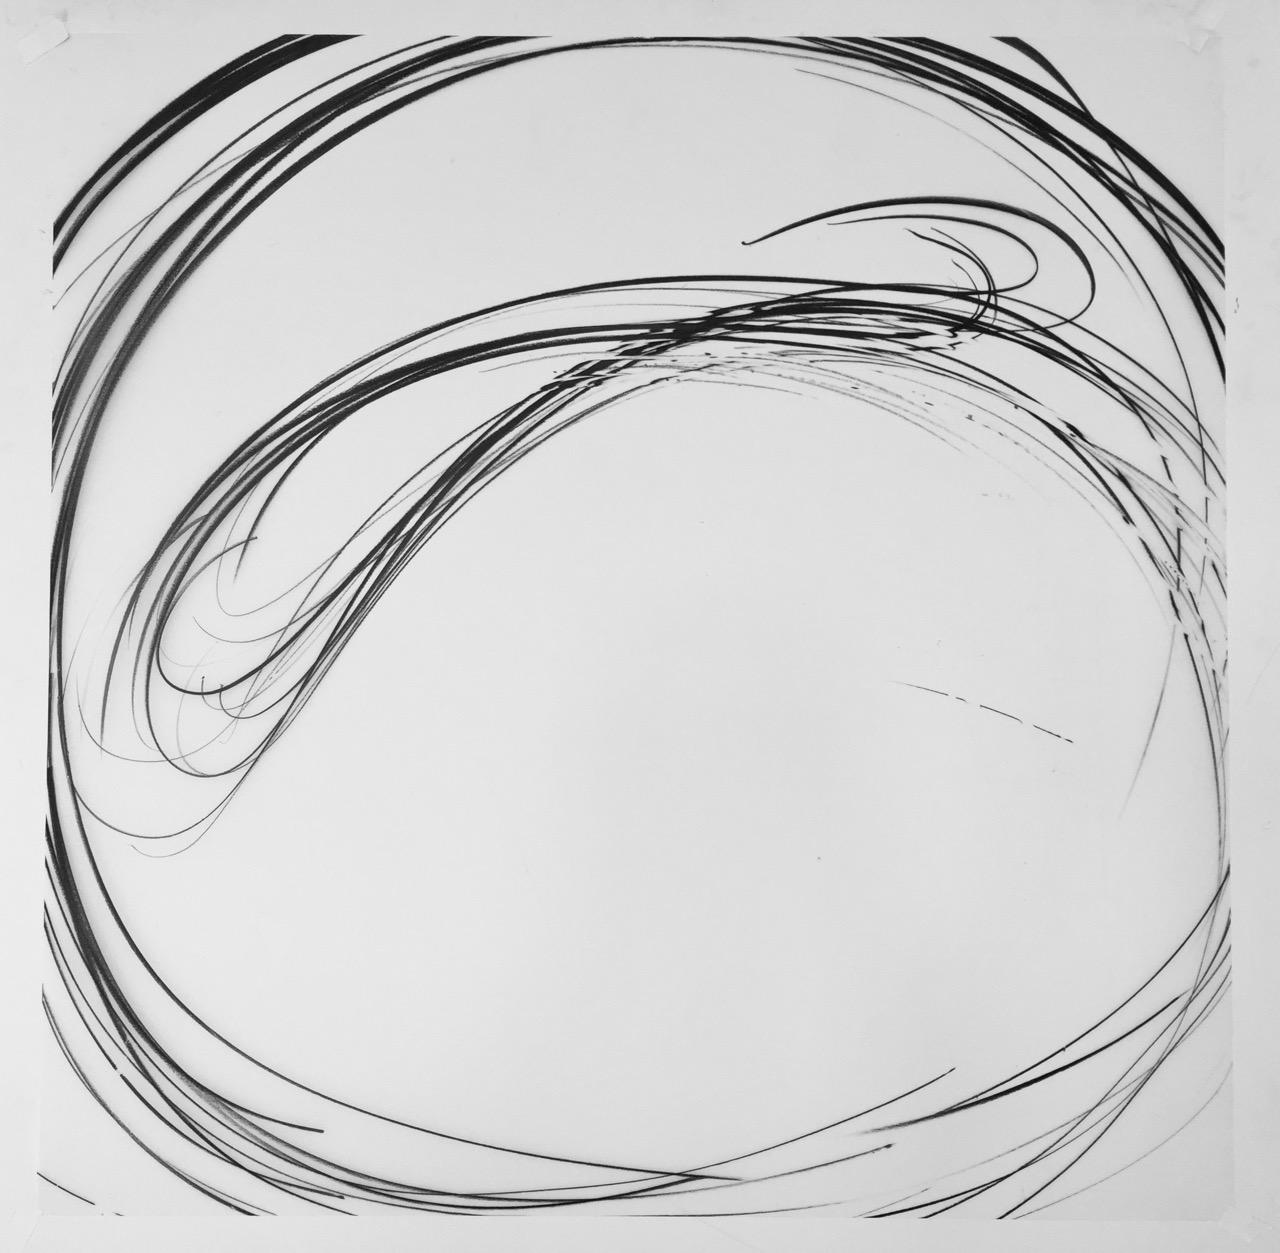 Jaanika Peerna  Maelstrom Series #78 ,2018 wax pencil on mylar 36 x 36 in.